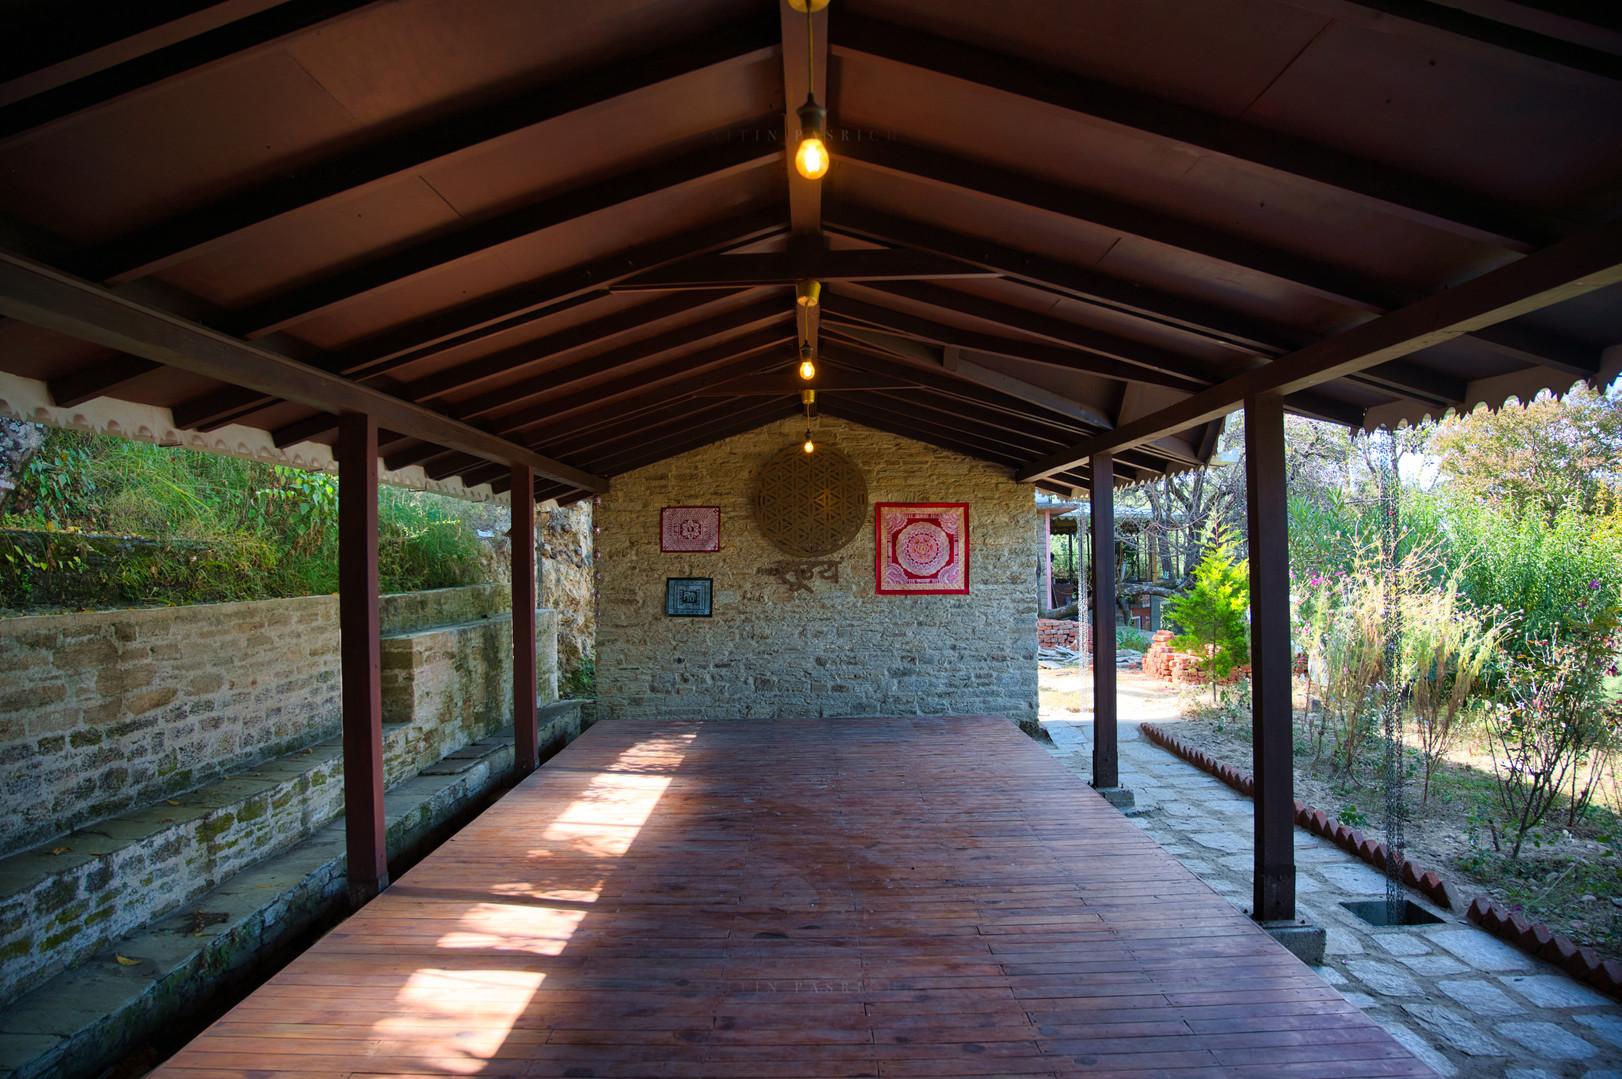 Shoonya the yoga Deck